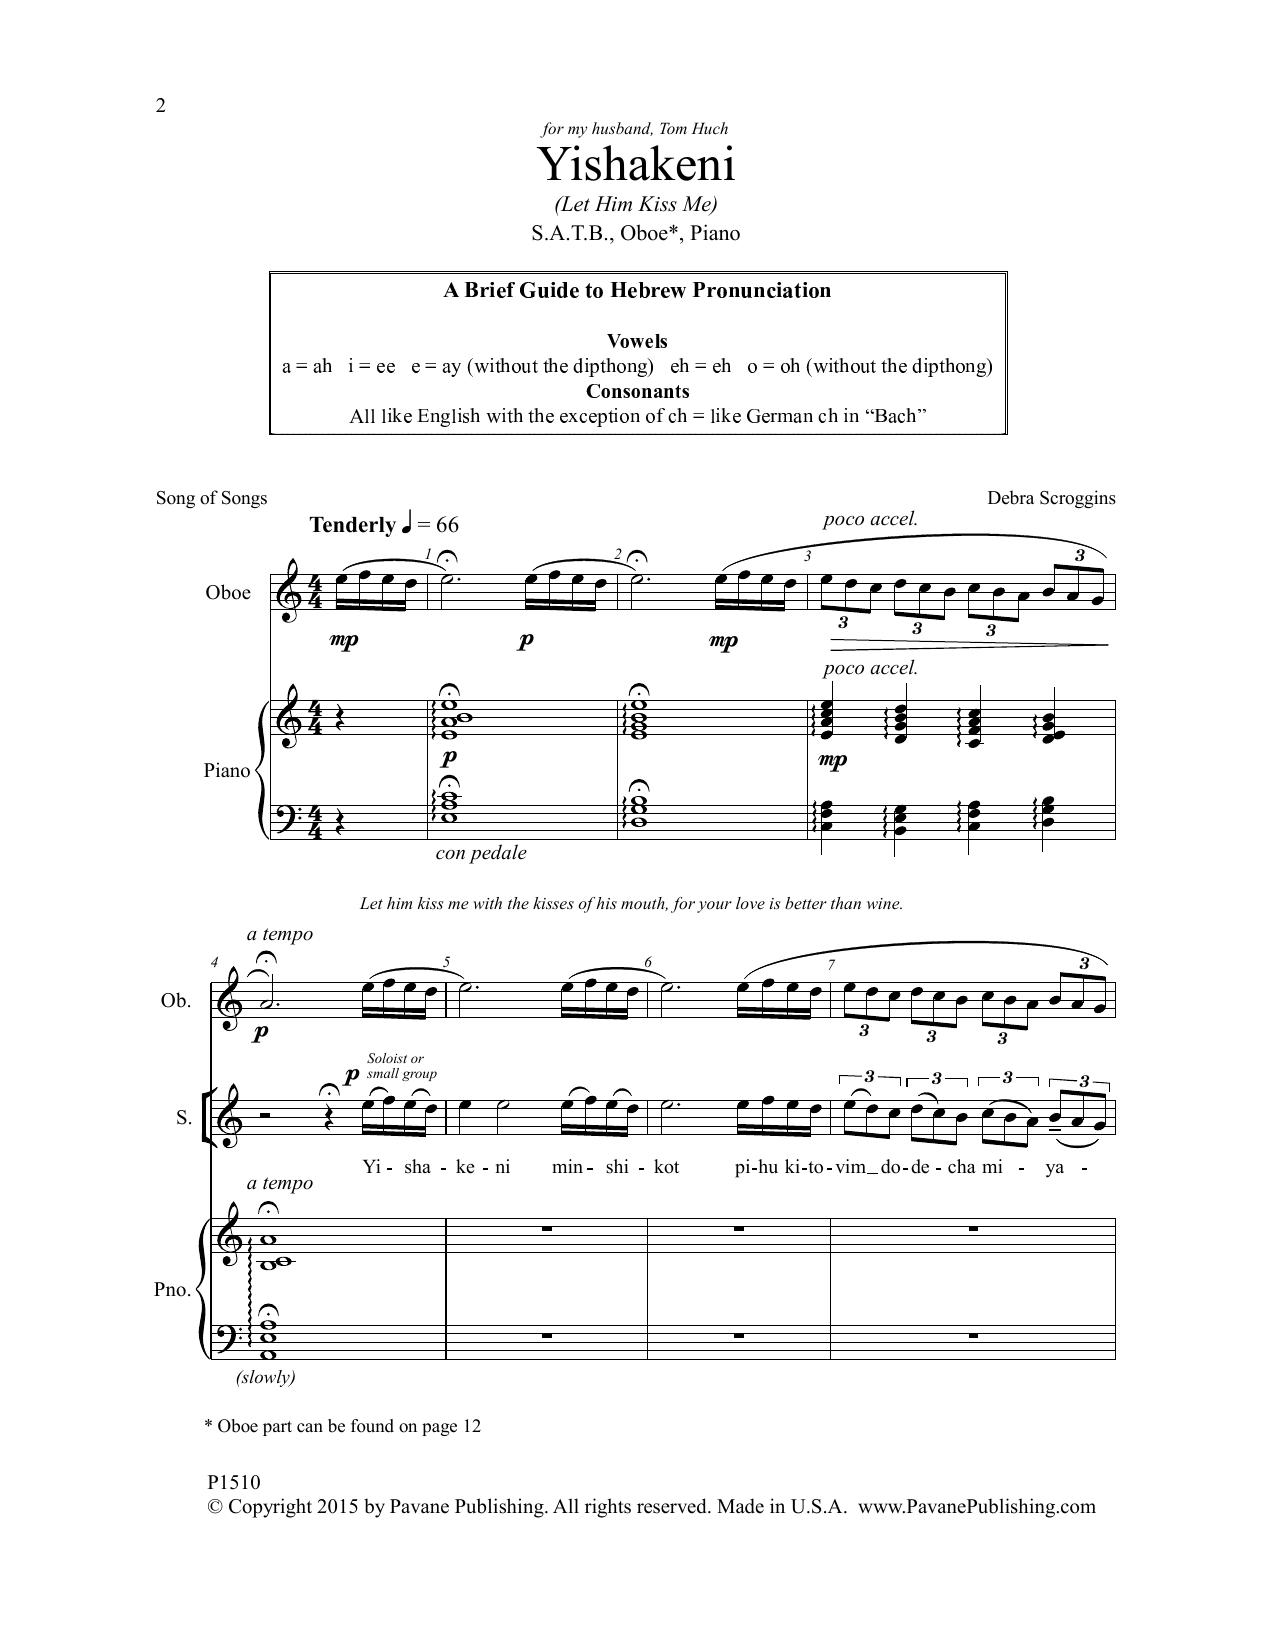 Yishakeni Sheet Music